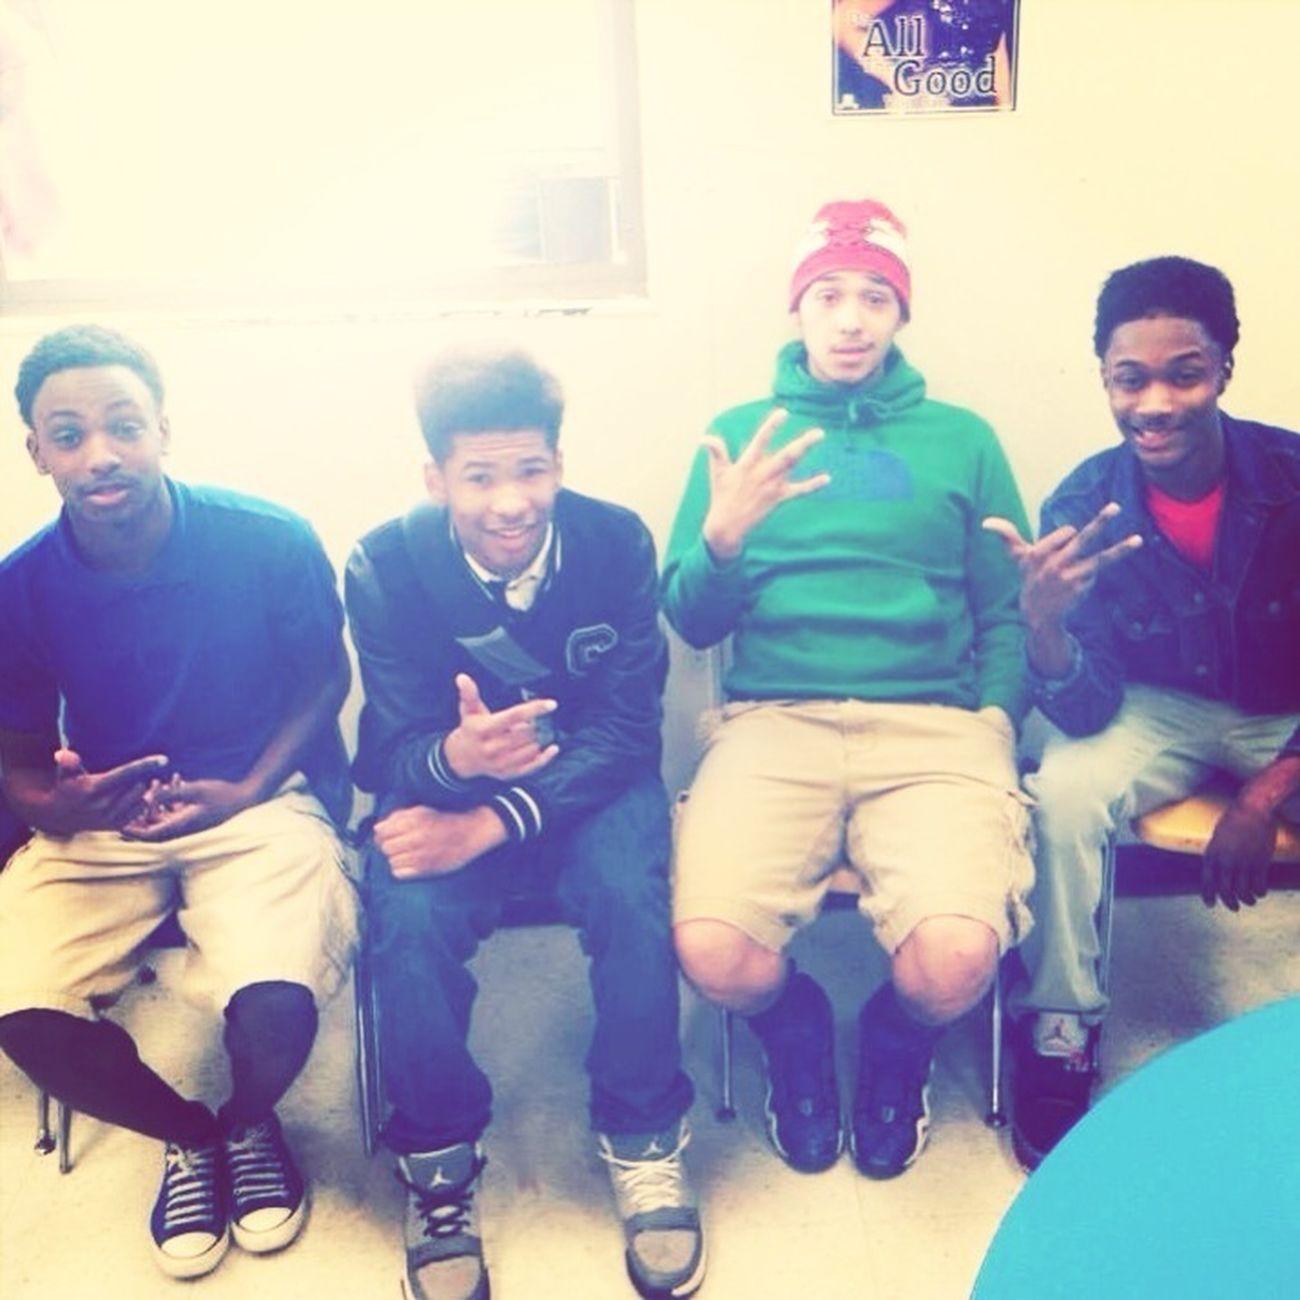 Me Tre Dre & WhiteBoy